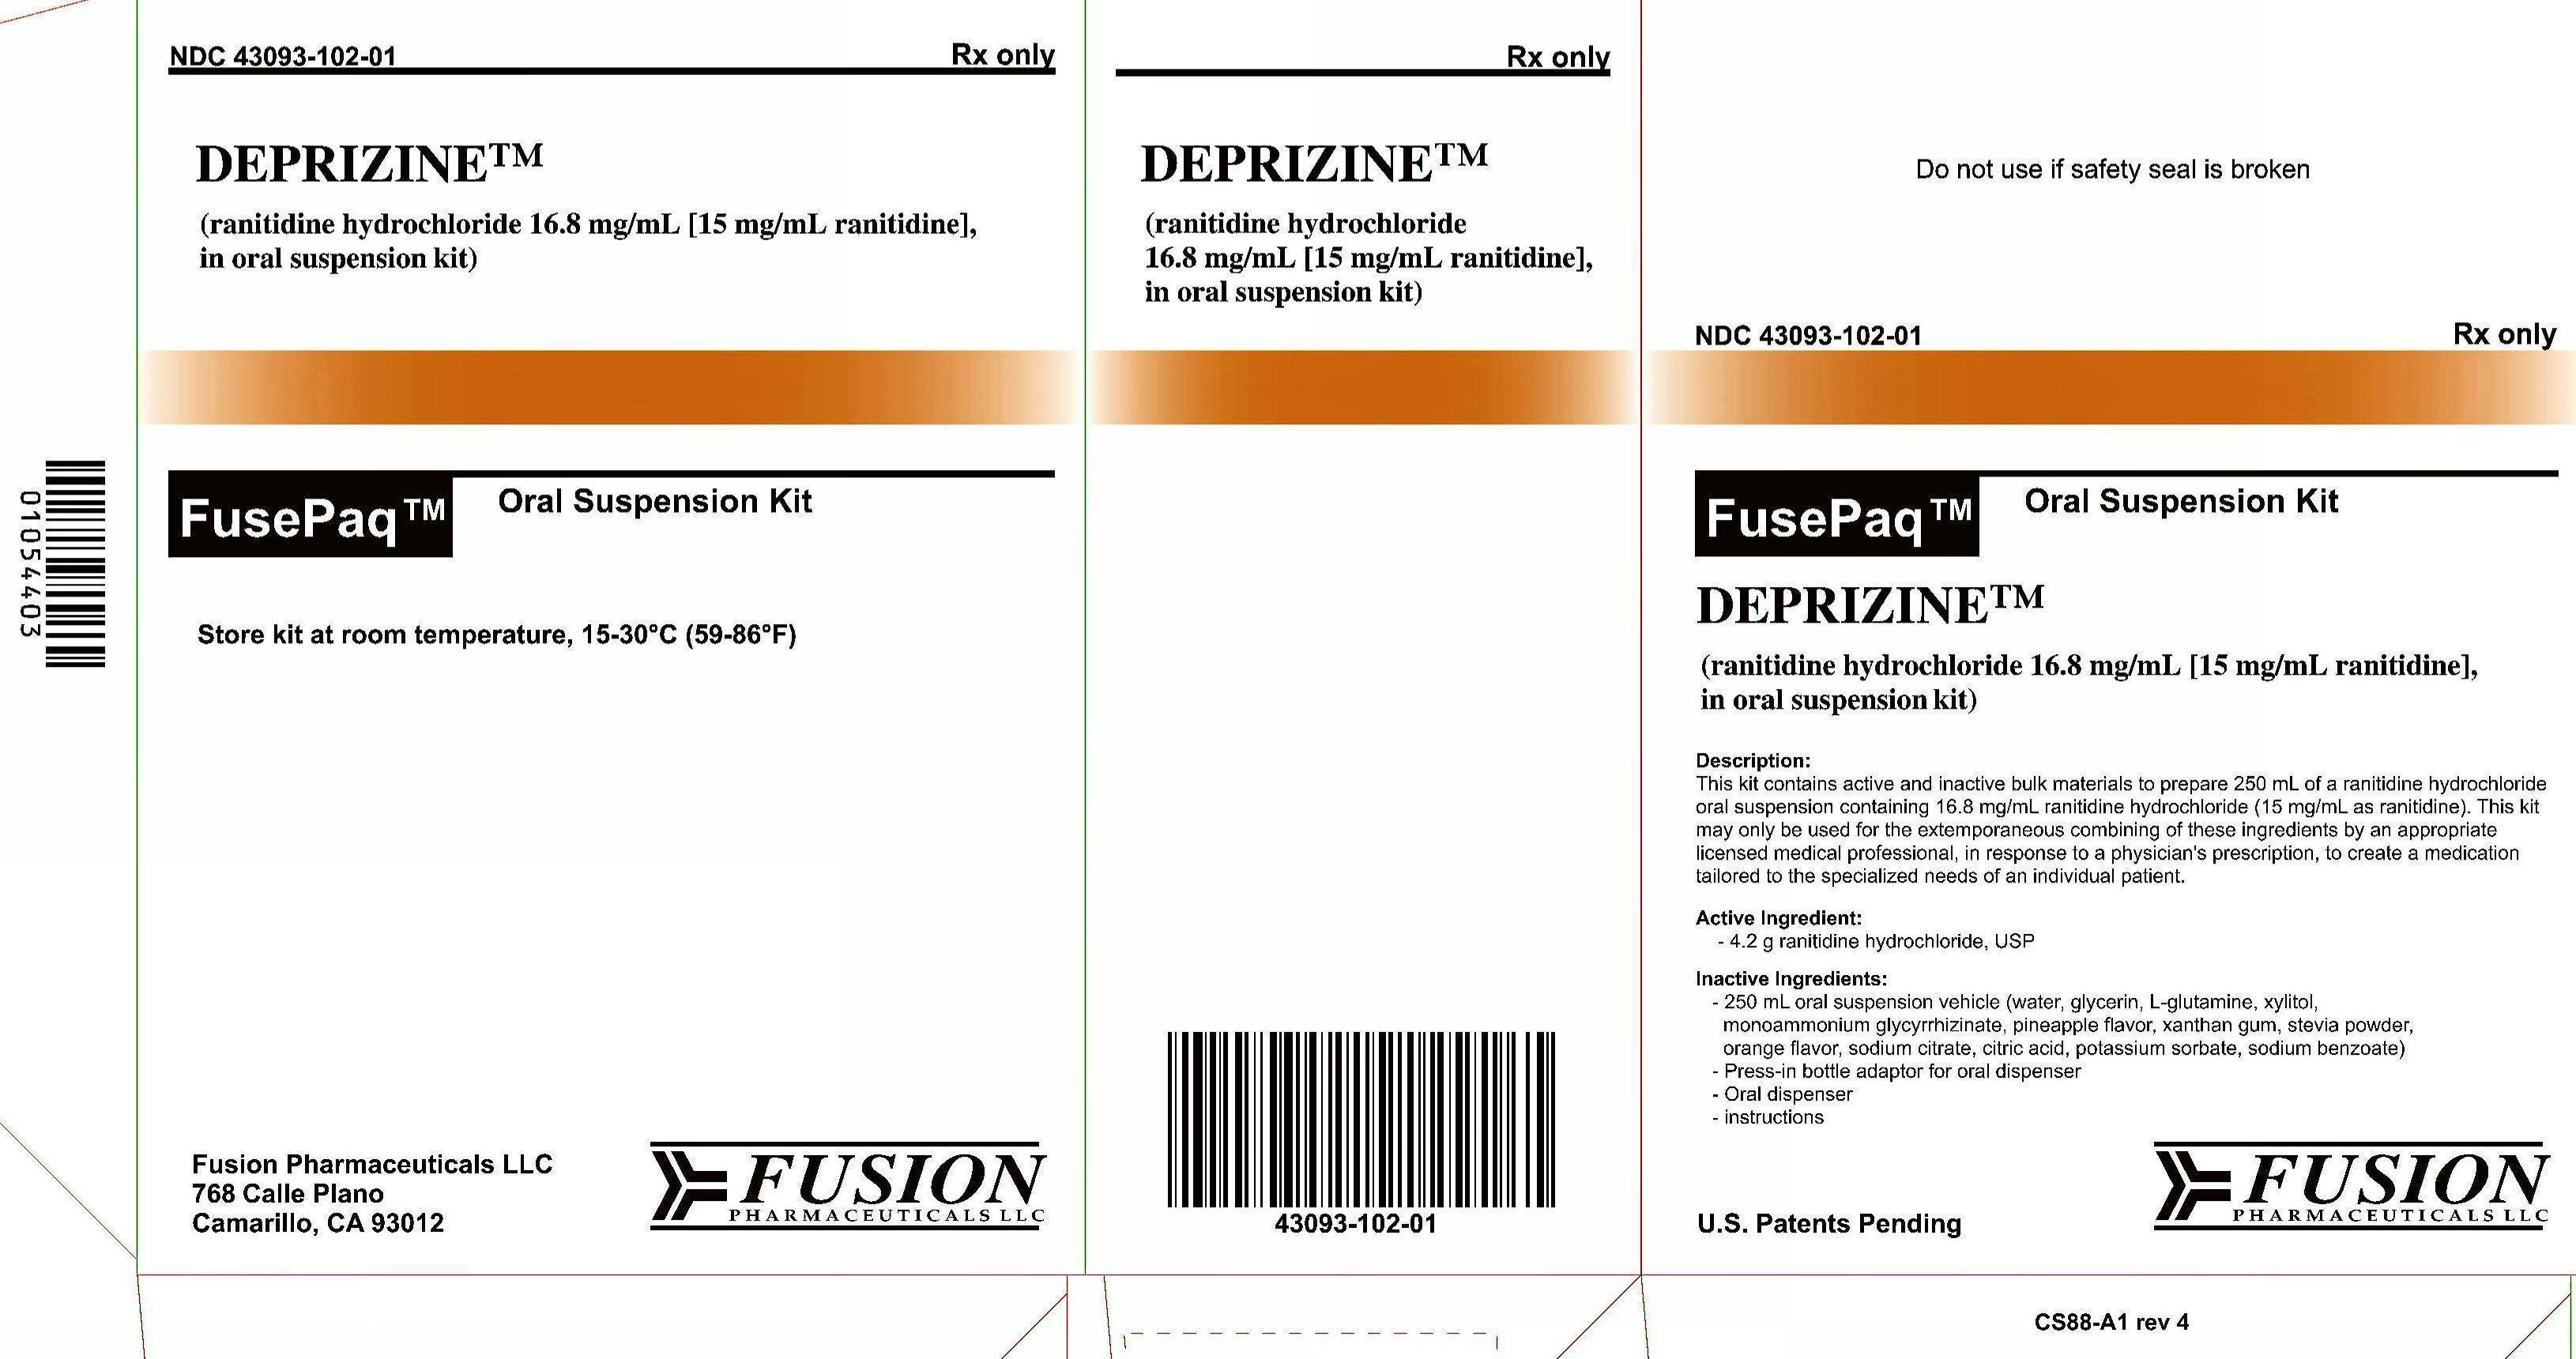 Deprizine | Ranitidine Hydrochloride Kit and breastfeeding